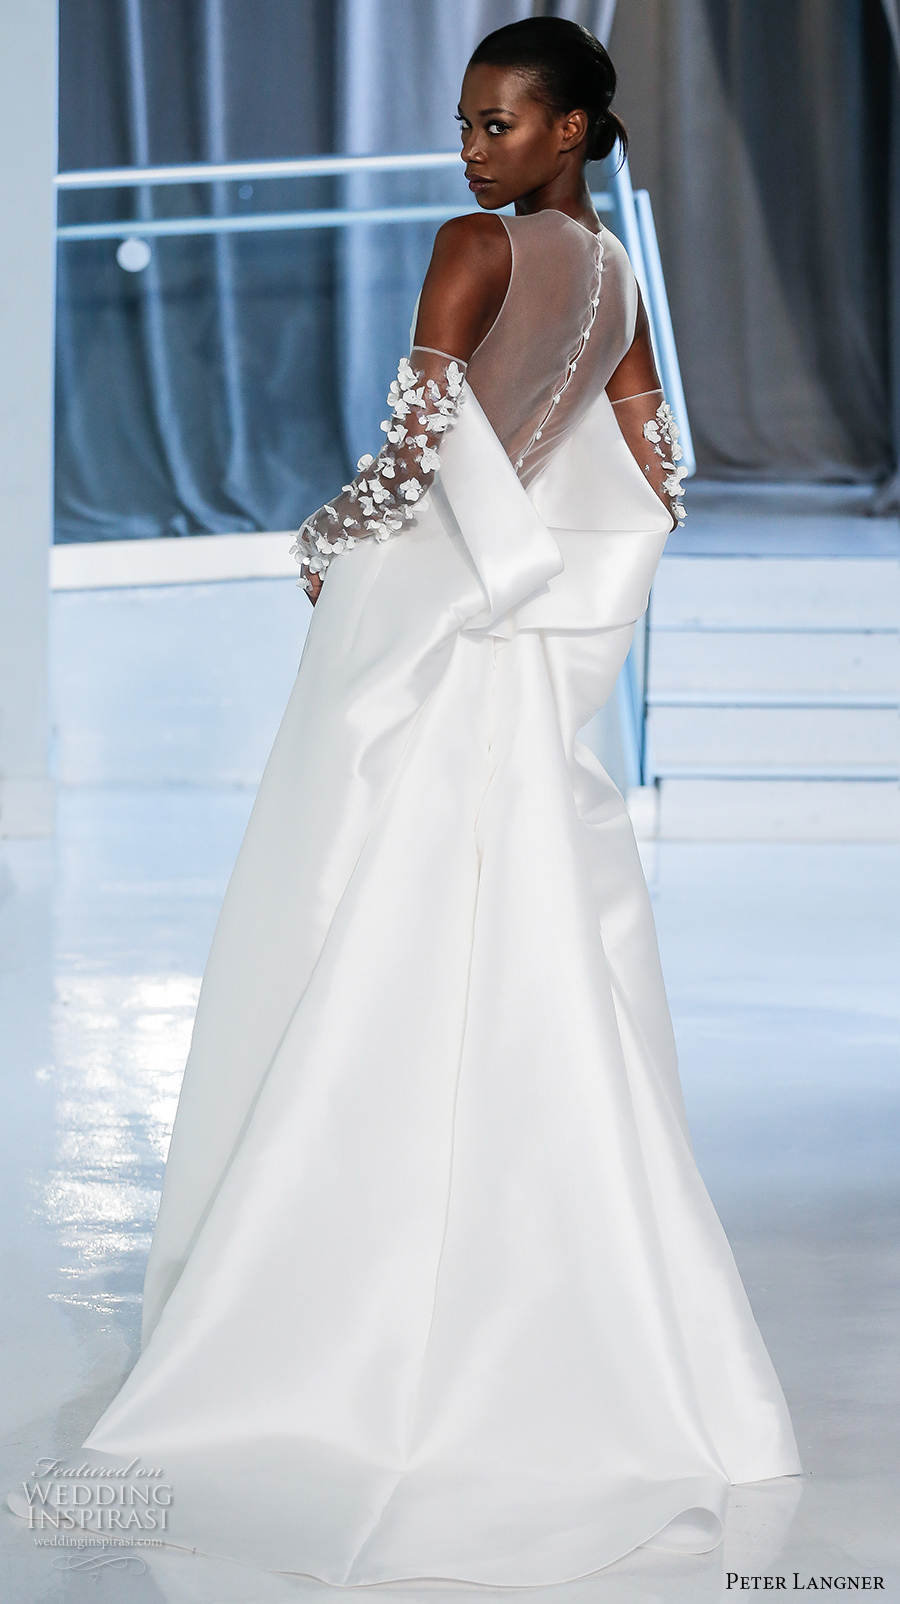 AUSTENpeter-langner-spring-2018-bridal-sleeveless-halter-neck-light-embellished-bodice-simple-elegant-fit-and-flare-wedding-dress-sheer-back-chapel-train-14-bv (2).jpg